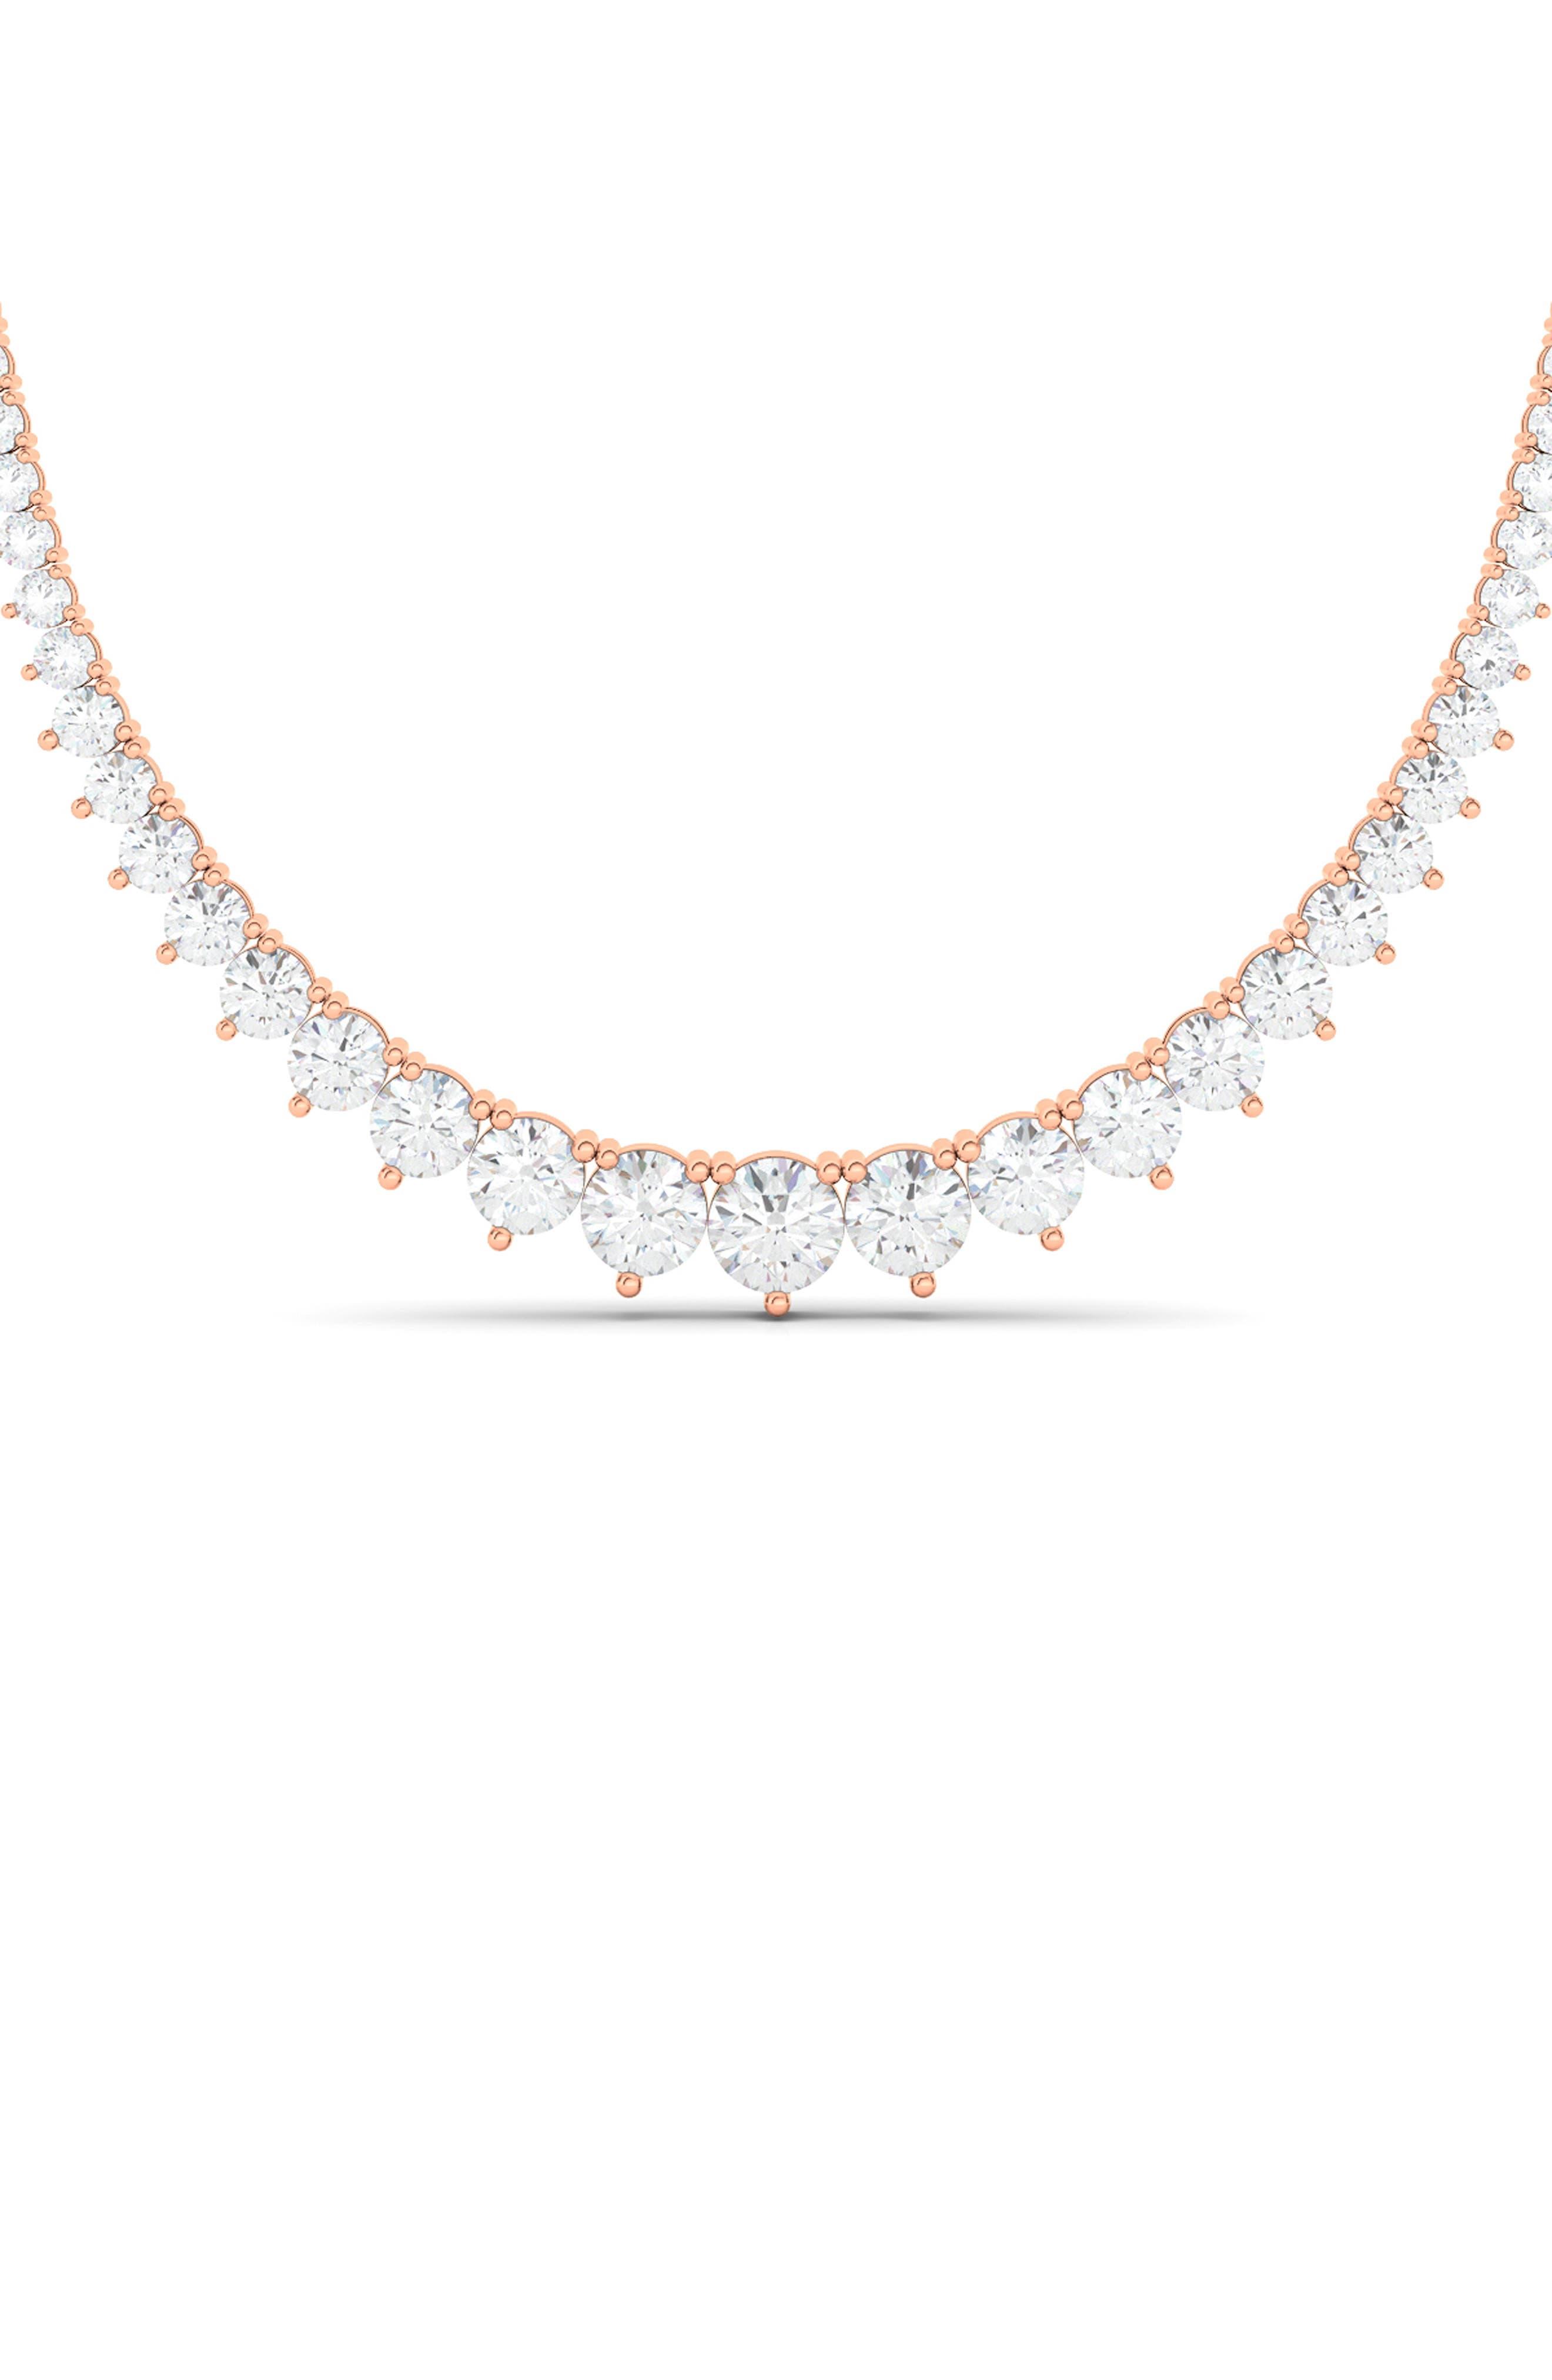 Graduated Lab Created Diamond Necklace